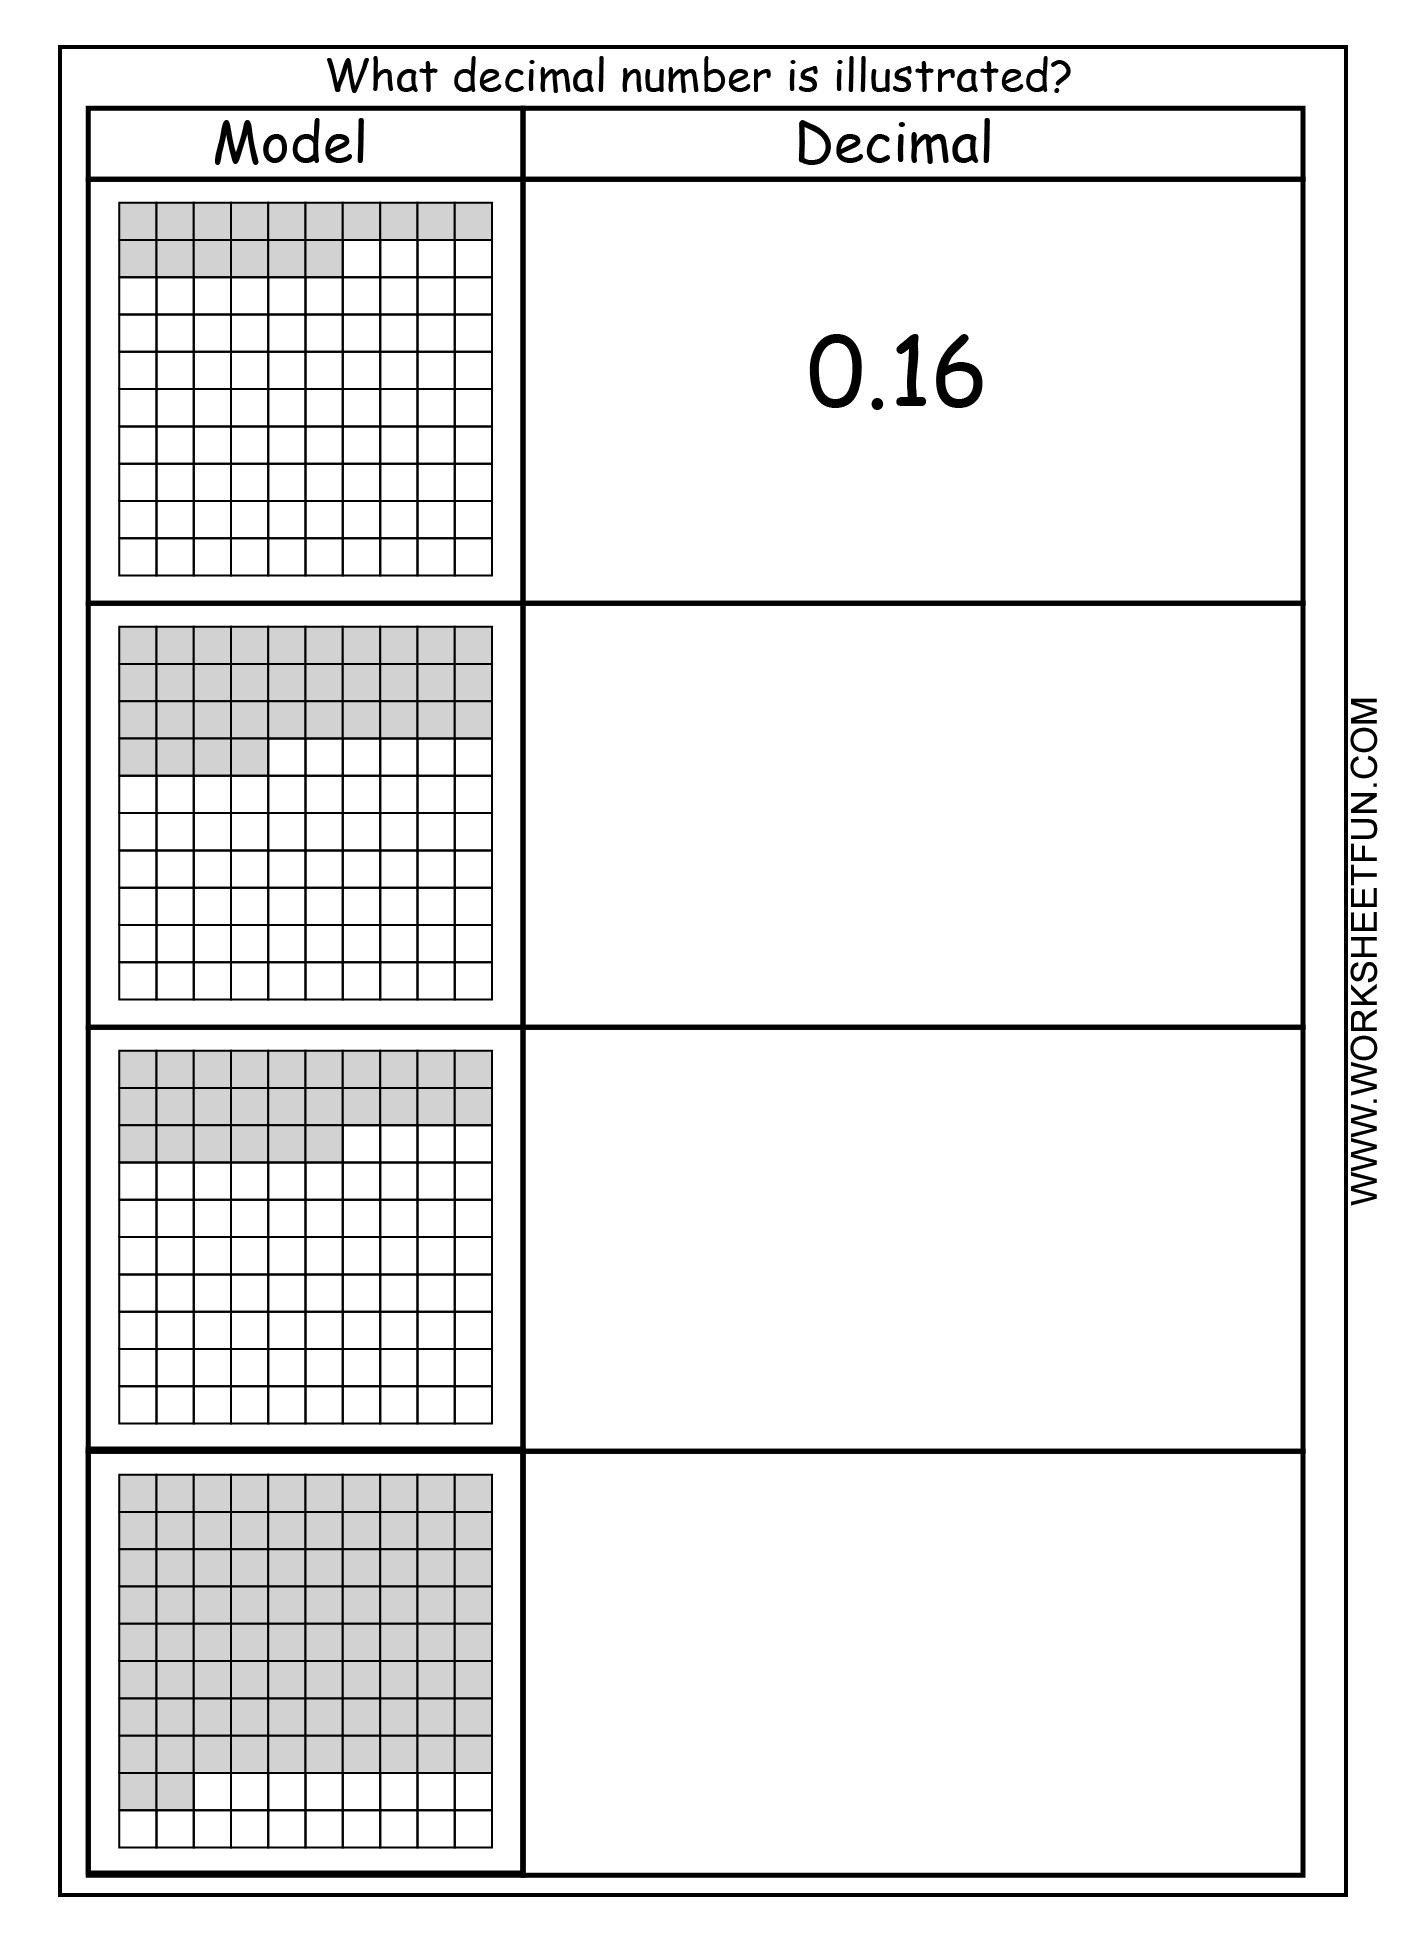 Converting Fractions To Decimals Hundredths Worksheet